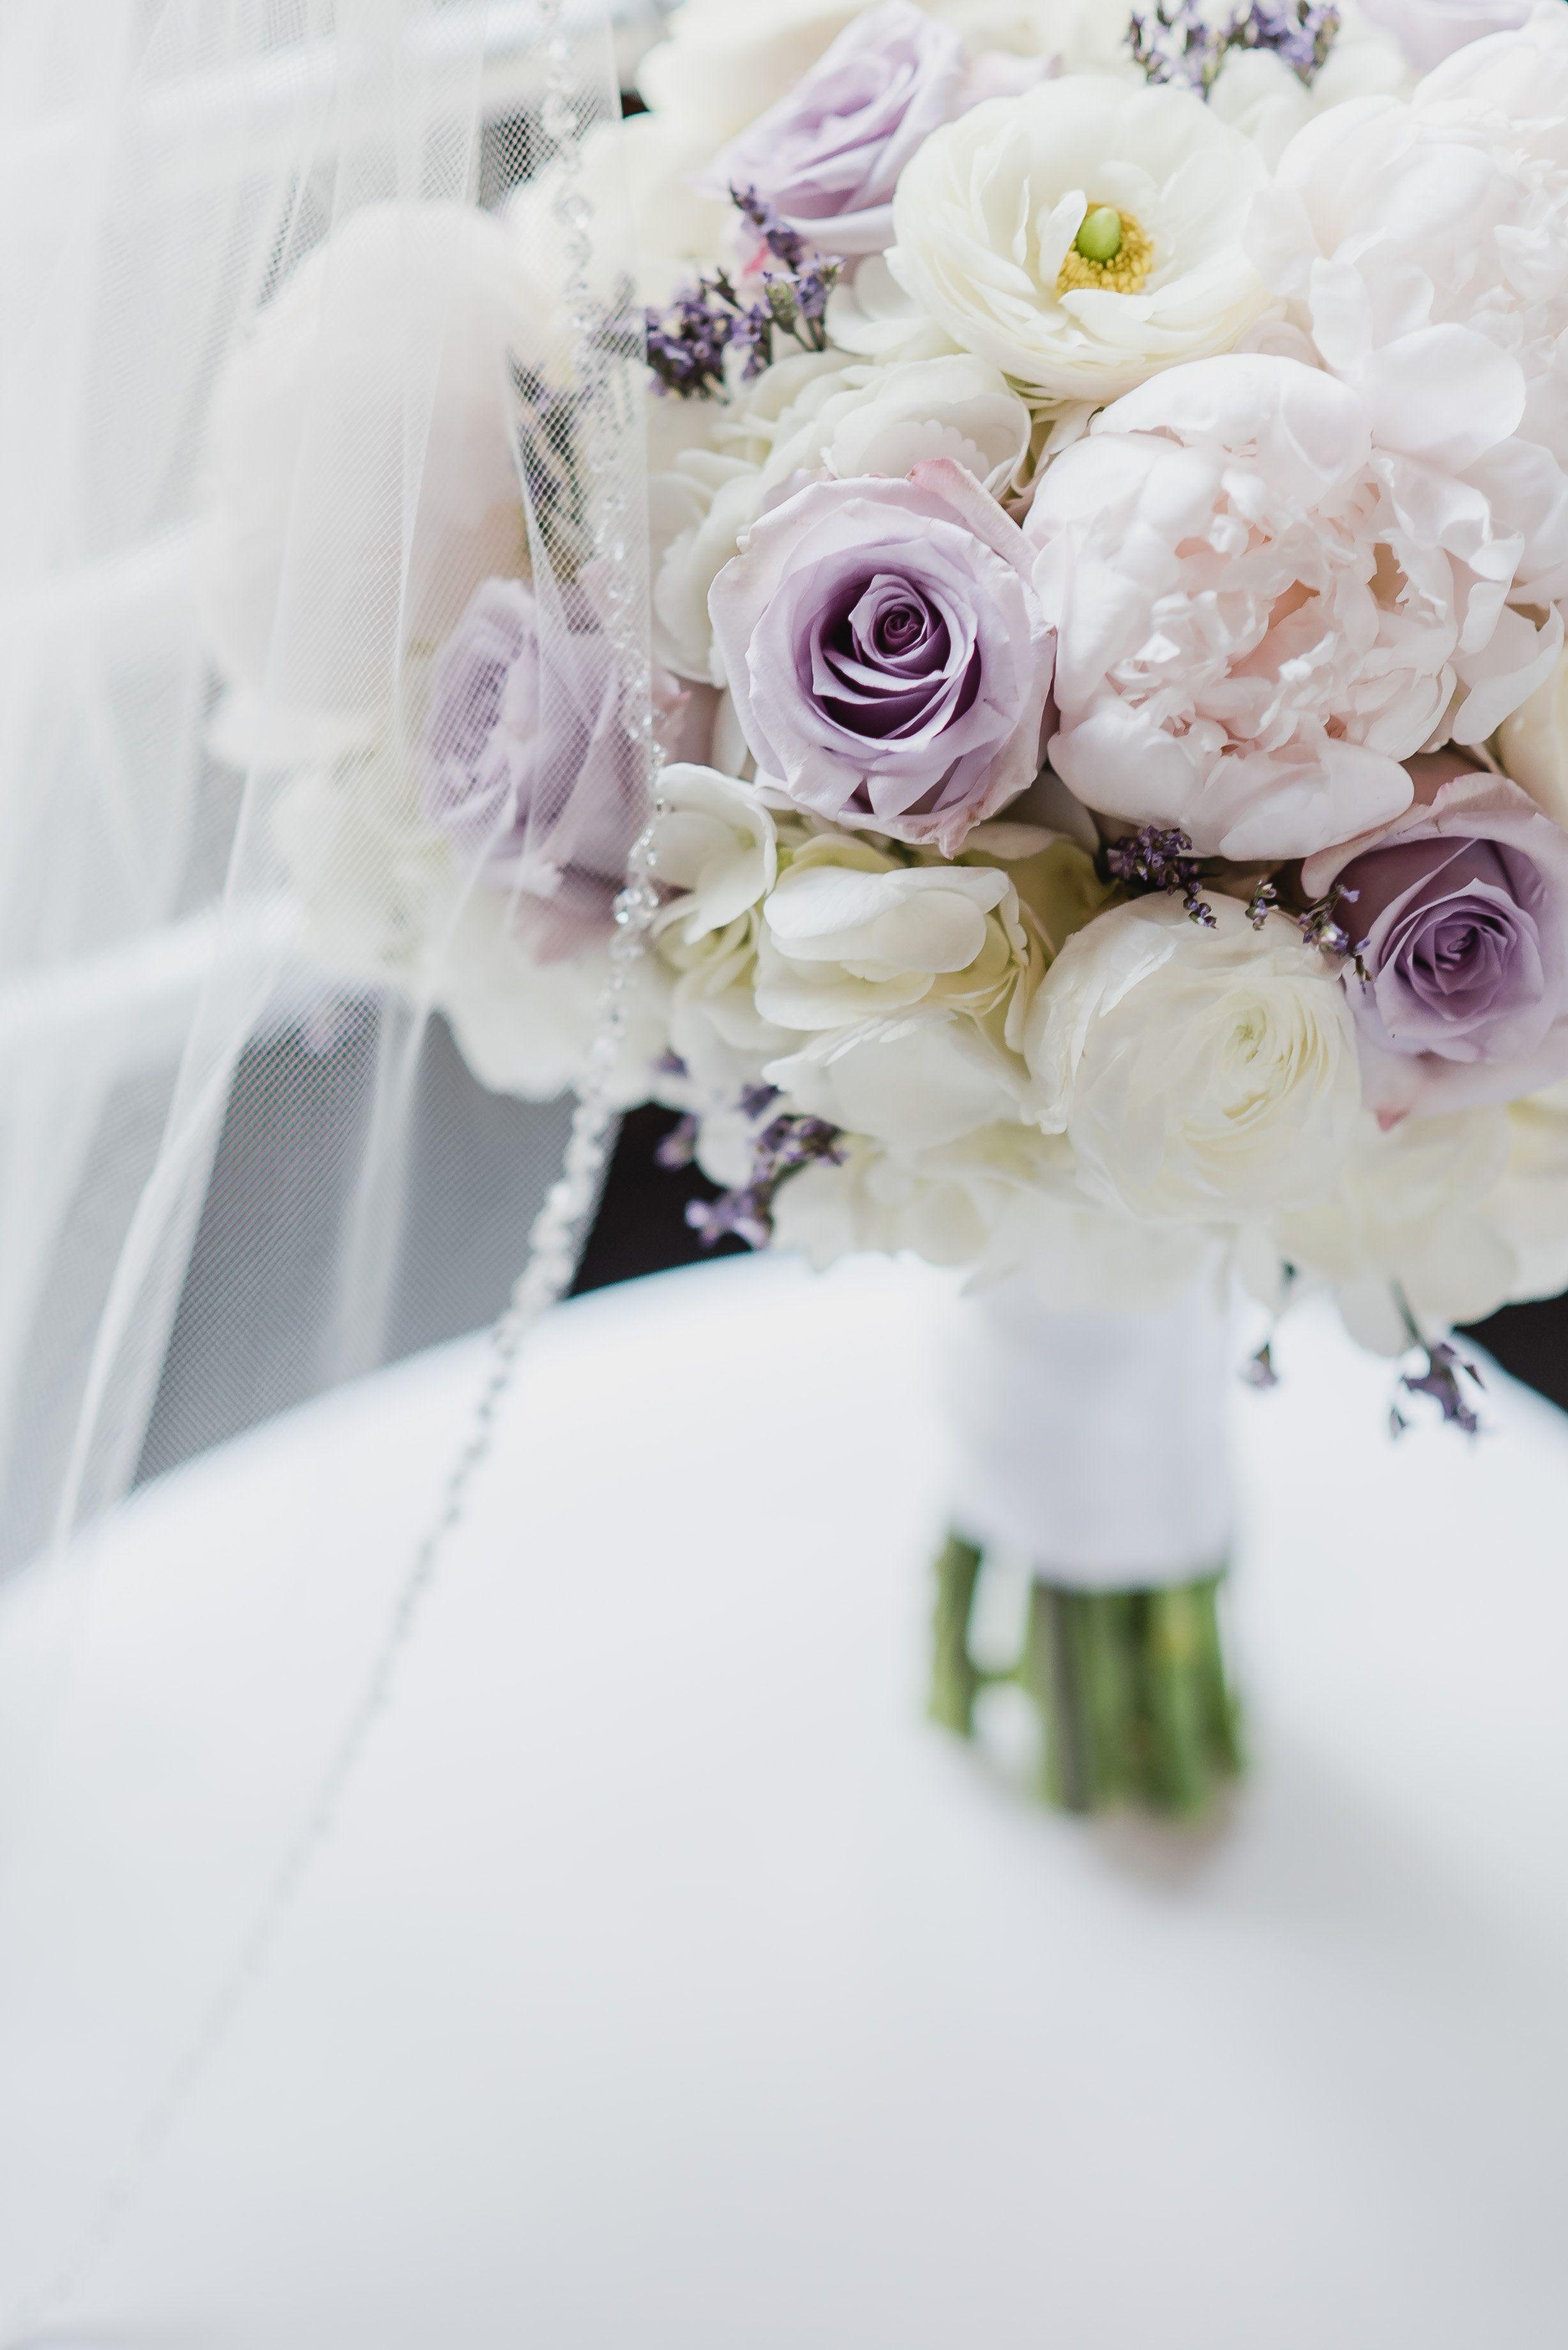 Floral Sense Llc Round Bride Bouquet With White Hydrangea Blush Peonies Lavender Rose Wedding Bouquets Pink Pink Peony Bouquet Wedding Purple Bride Bouquet